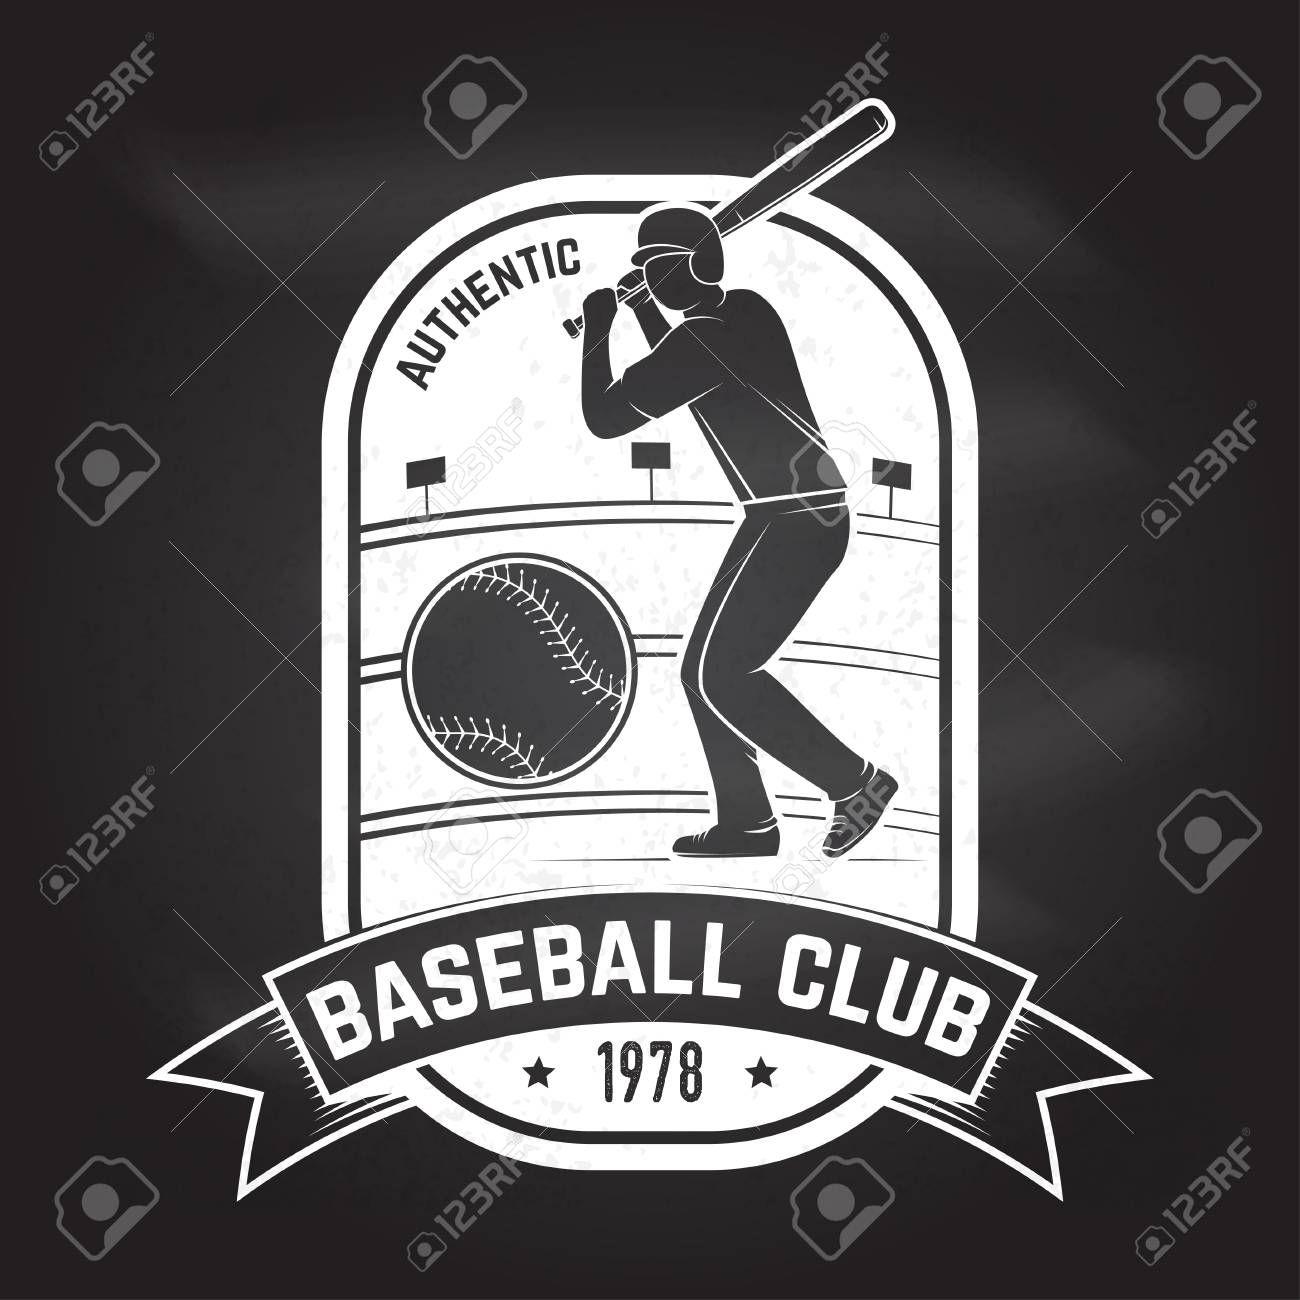 Baseball Or Softball Club Badge Vector Illustration Concept For Shirt Design Print Stamp Or Tee Illustra Club Badge Motion Graphics Animation Illustration